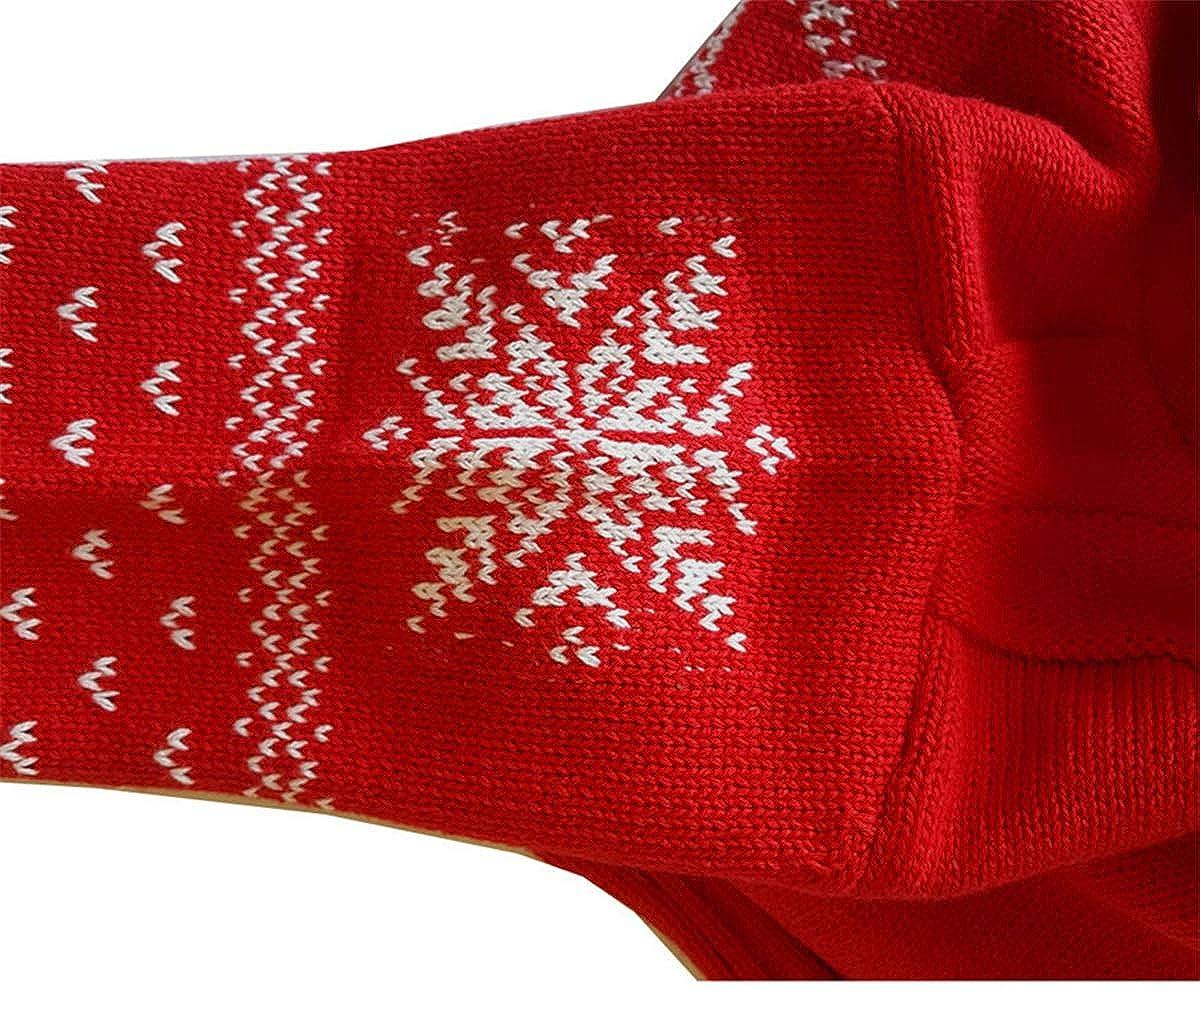 Dealone Baby Boys Girls Long Sleeve Cardigan Toddler Cotton Knitting Sweater Outerwear